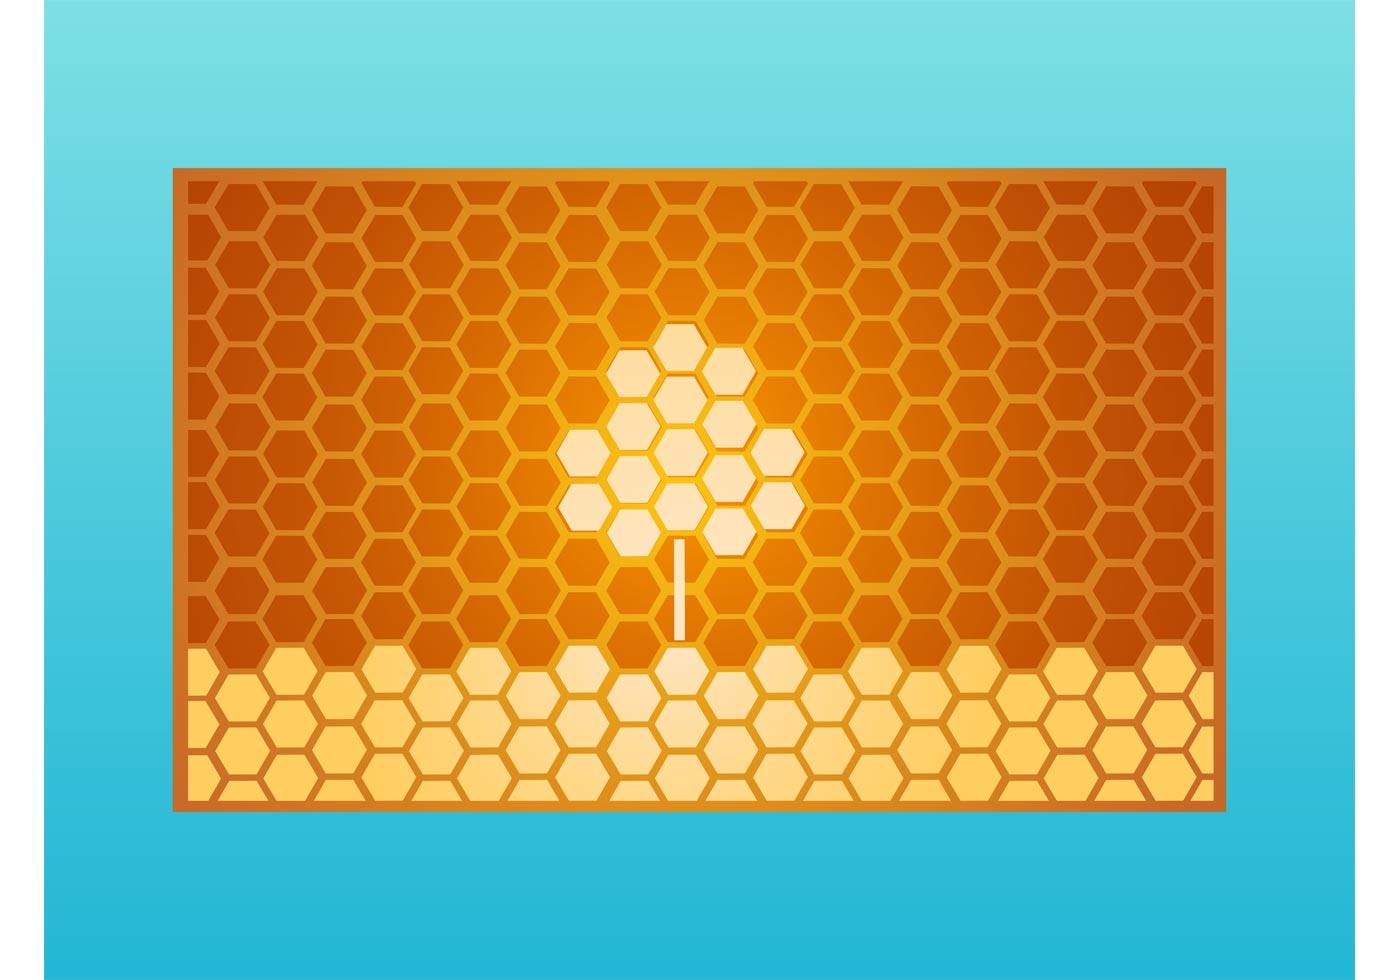 Honeycomb Tree - Download Free Vector Art, Stock Graphics ...